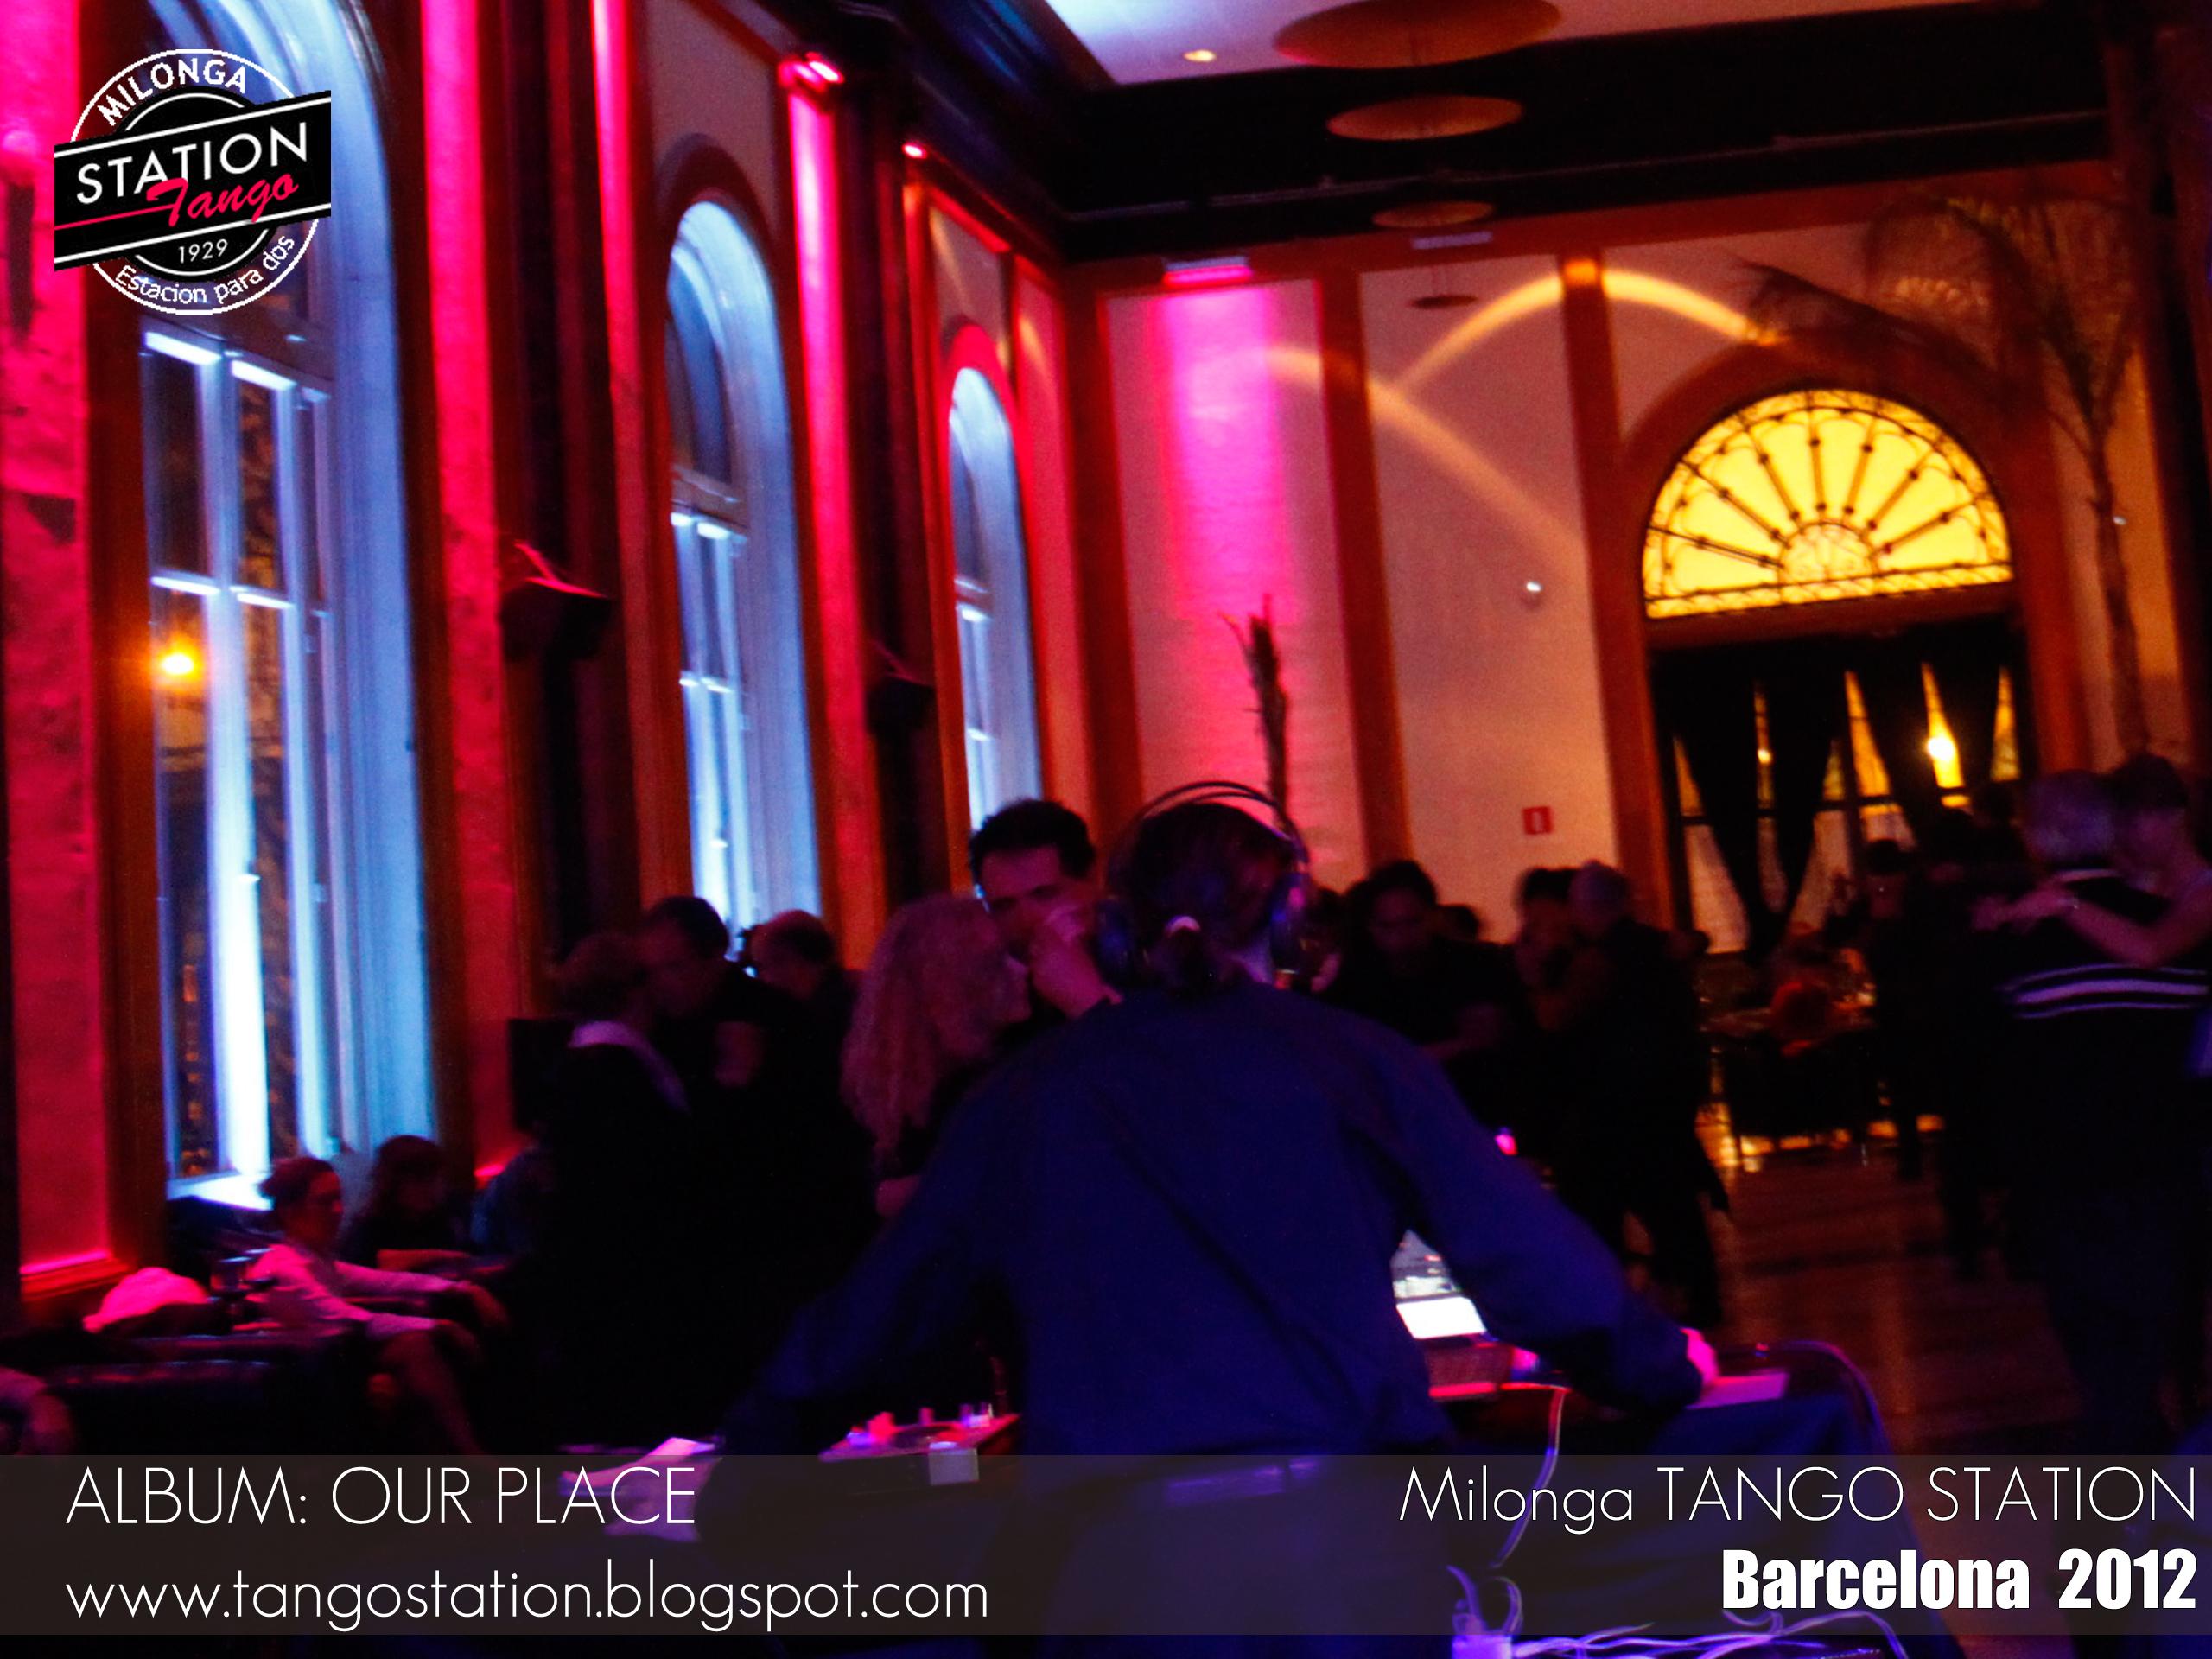 Tango Station Barcelona